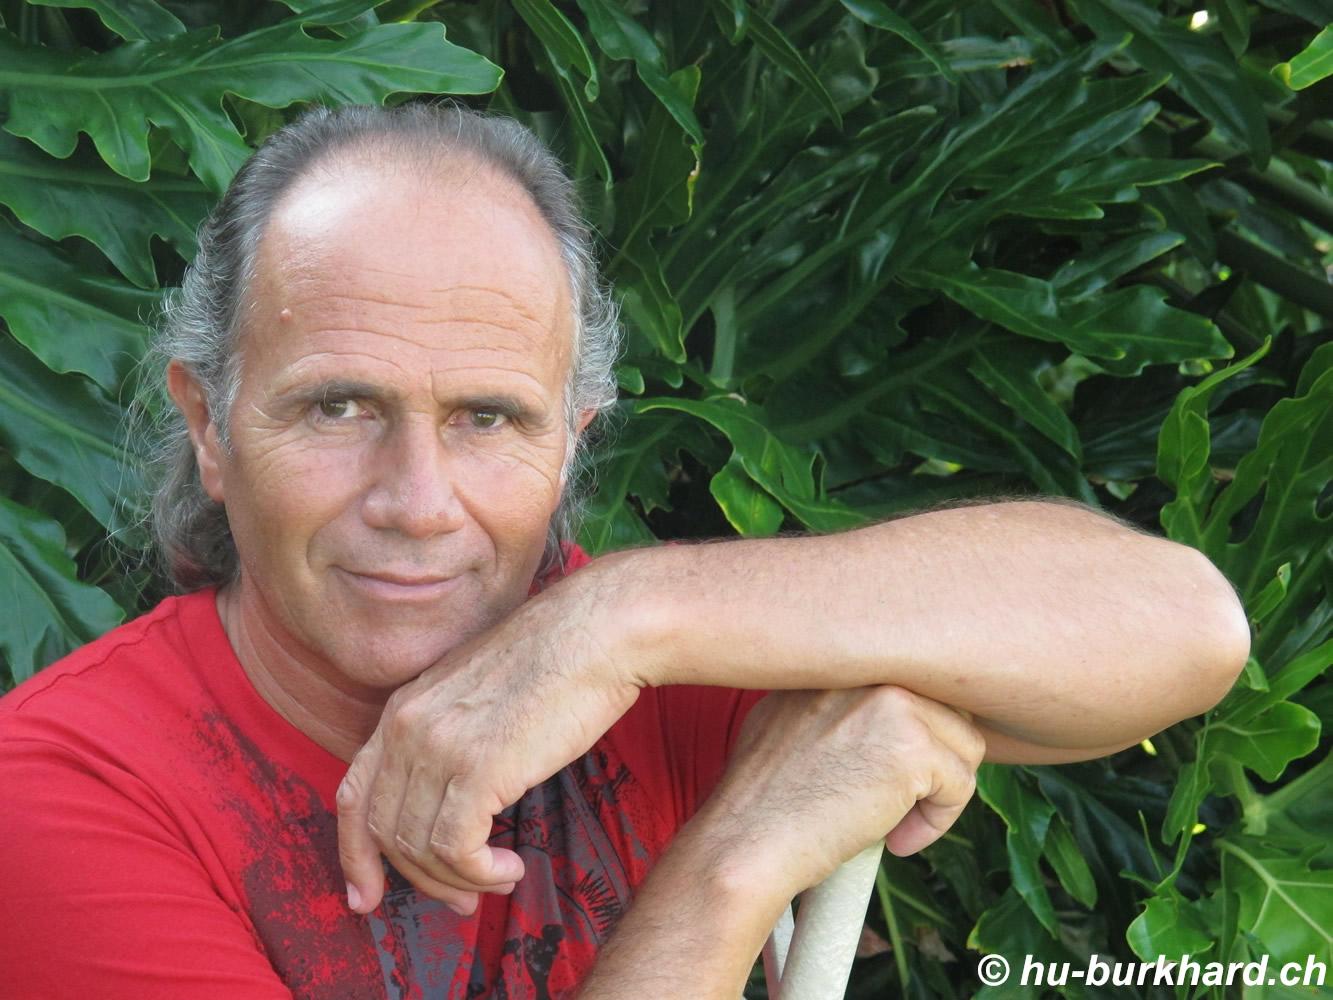 02-Foto-Hans-Ulrich BURKHARD - 02-Foto-Hans-Ulrich-BURKHARD